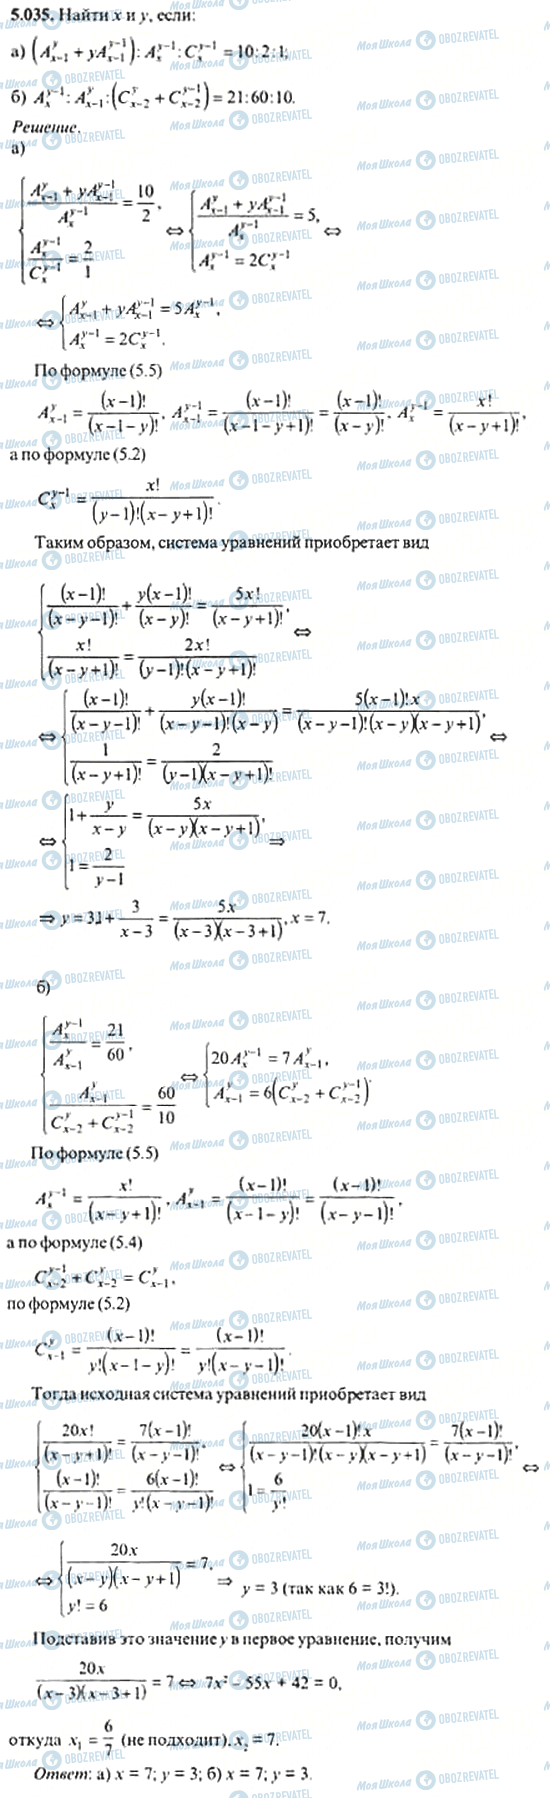 ГДЗ Алгебра 11 клас сторінка 5.035